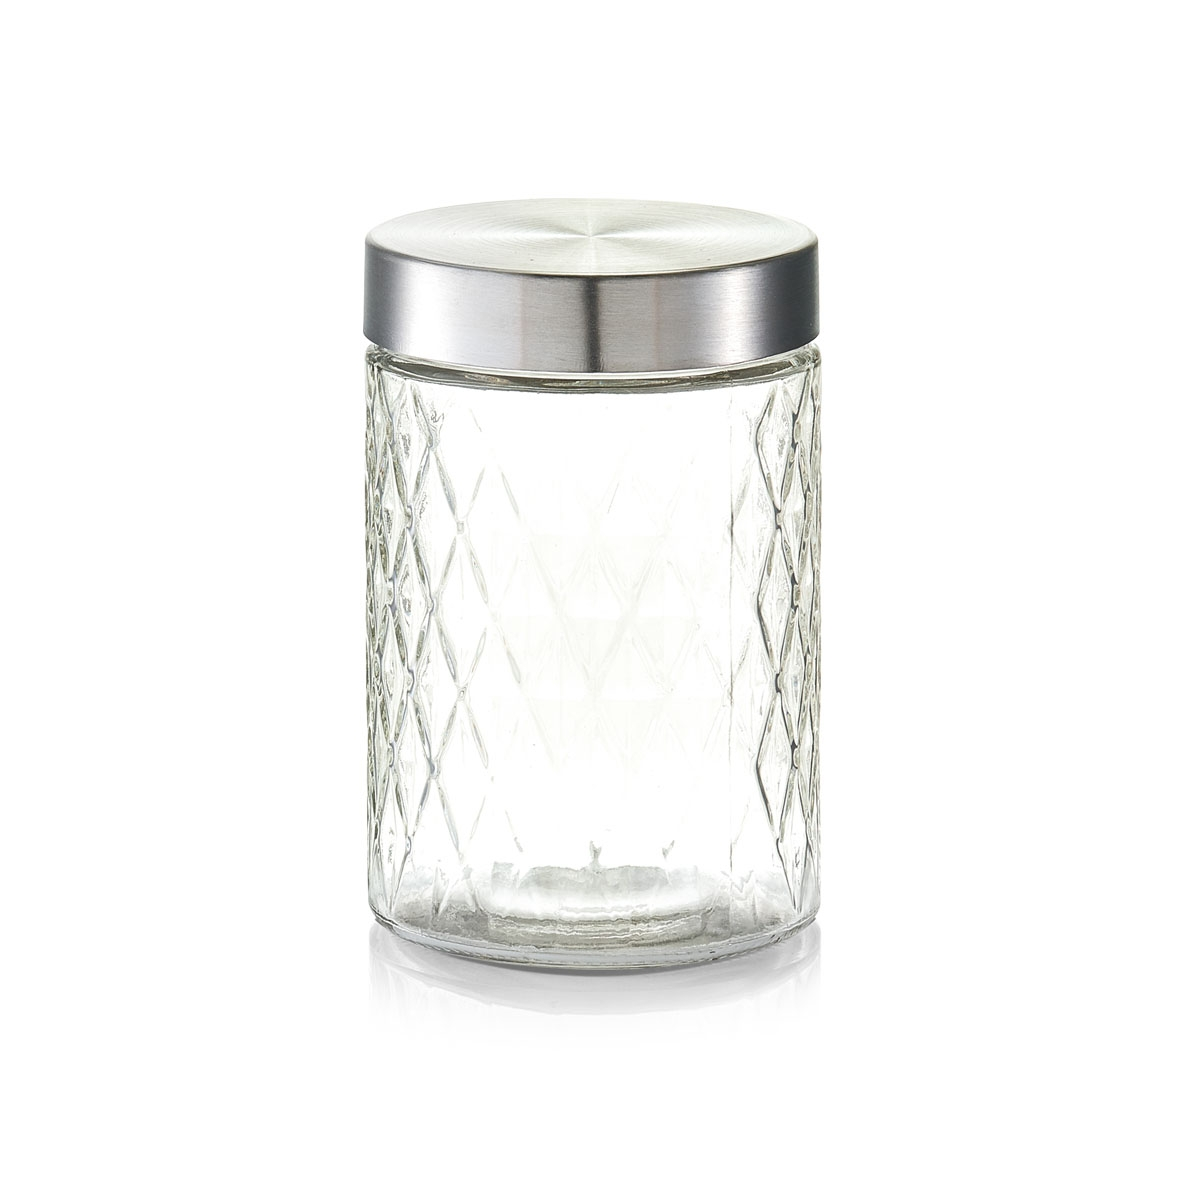 Recipient pentru depozitare cu capac metalic, Diamond I Glass, 1200 ml, Ø 11xH17 cm imagine